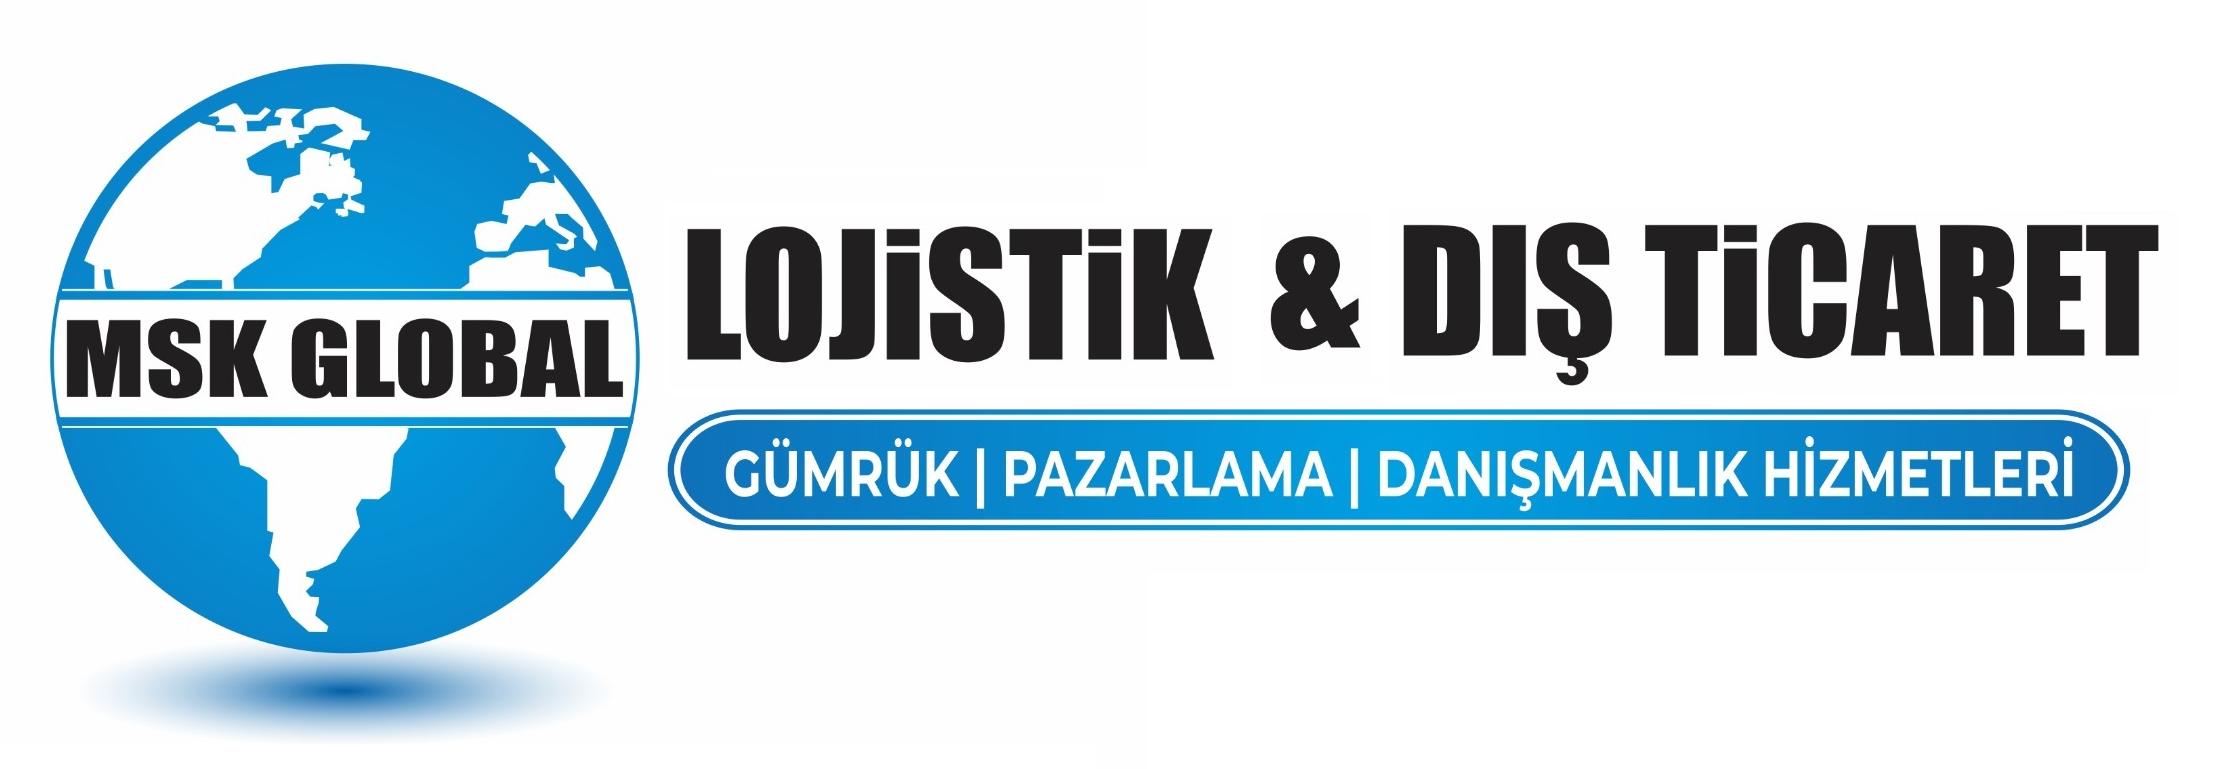 MSK-GLOBAL Lojistik & Dış Ticaret